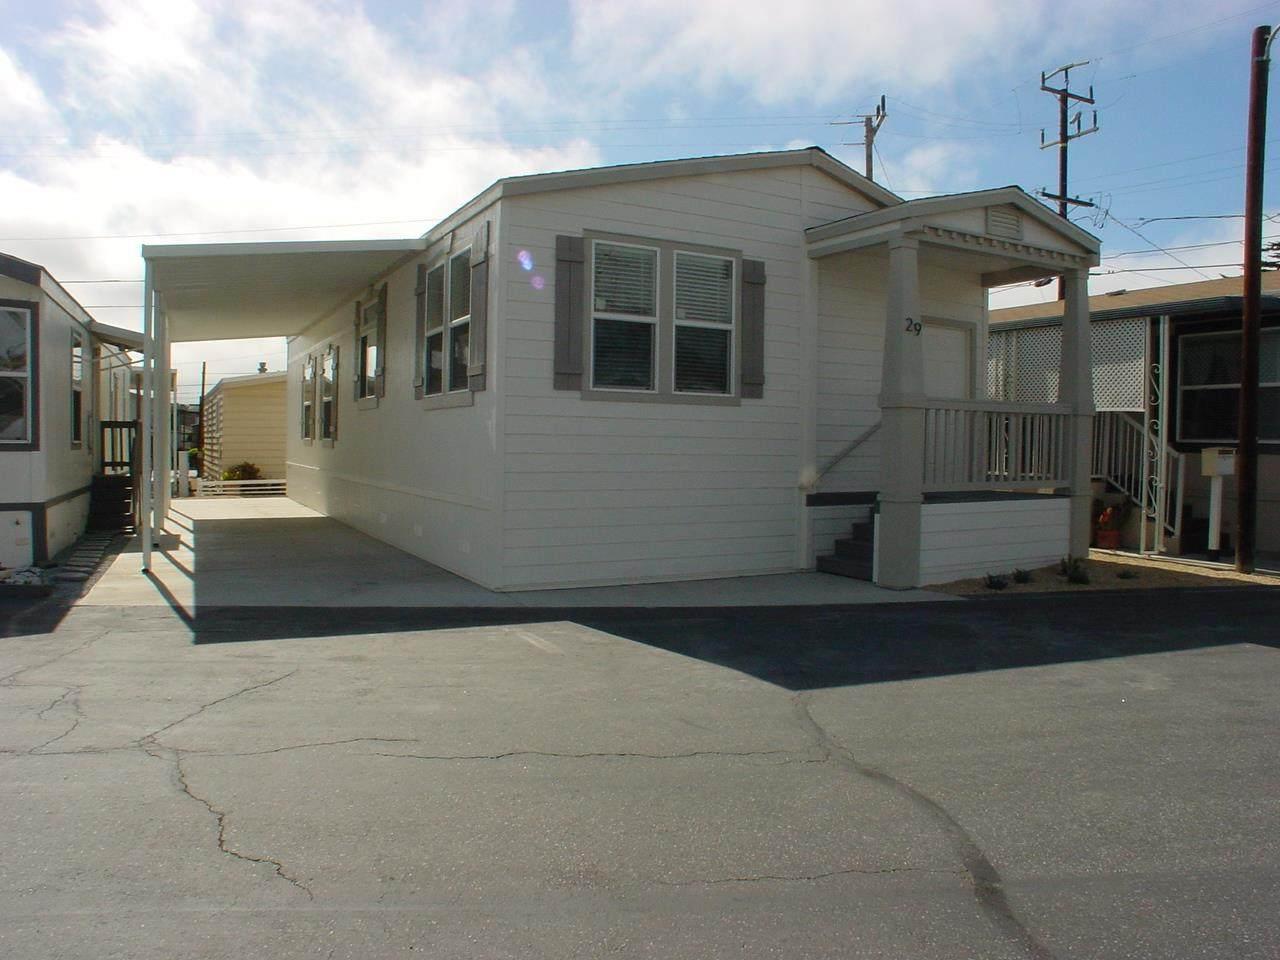 1146 Birch Ave 29 - Photo 1